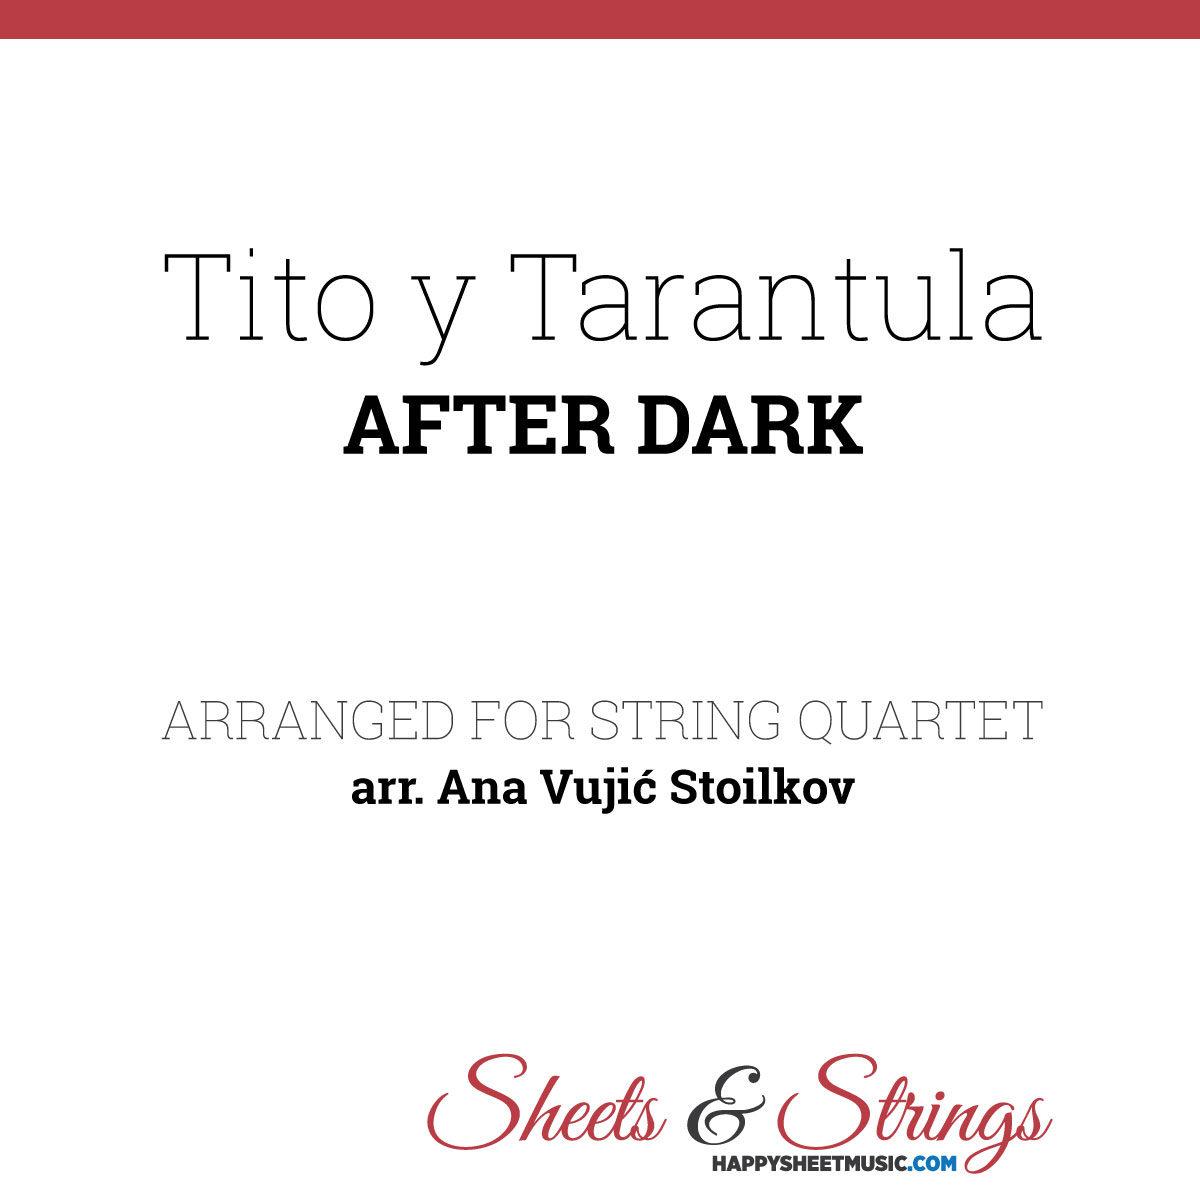 Tito y Tarantula - After Dark Sheet music for String Quartet